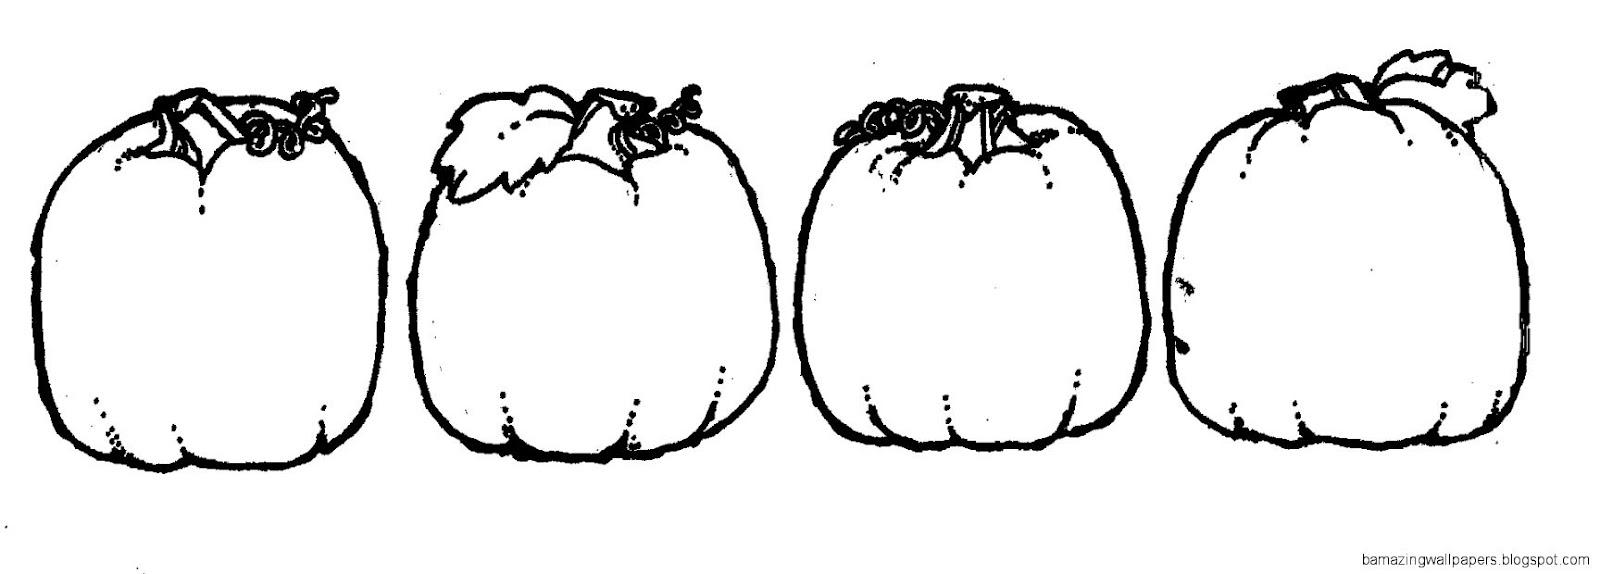 Pumpkin Border Black And White Clipart   Clipart Kid